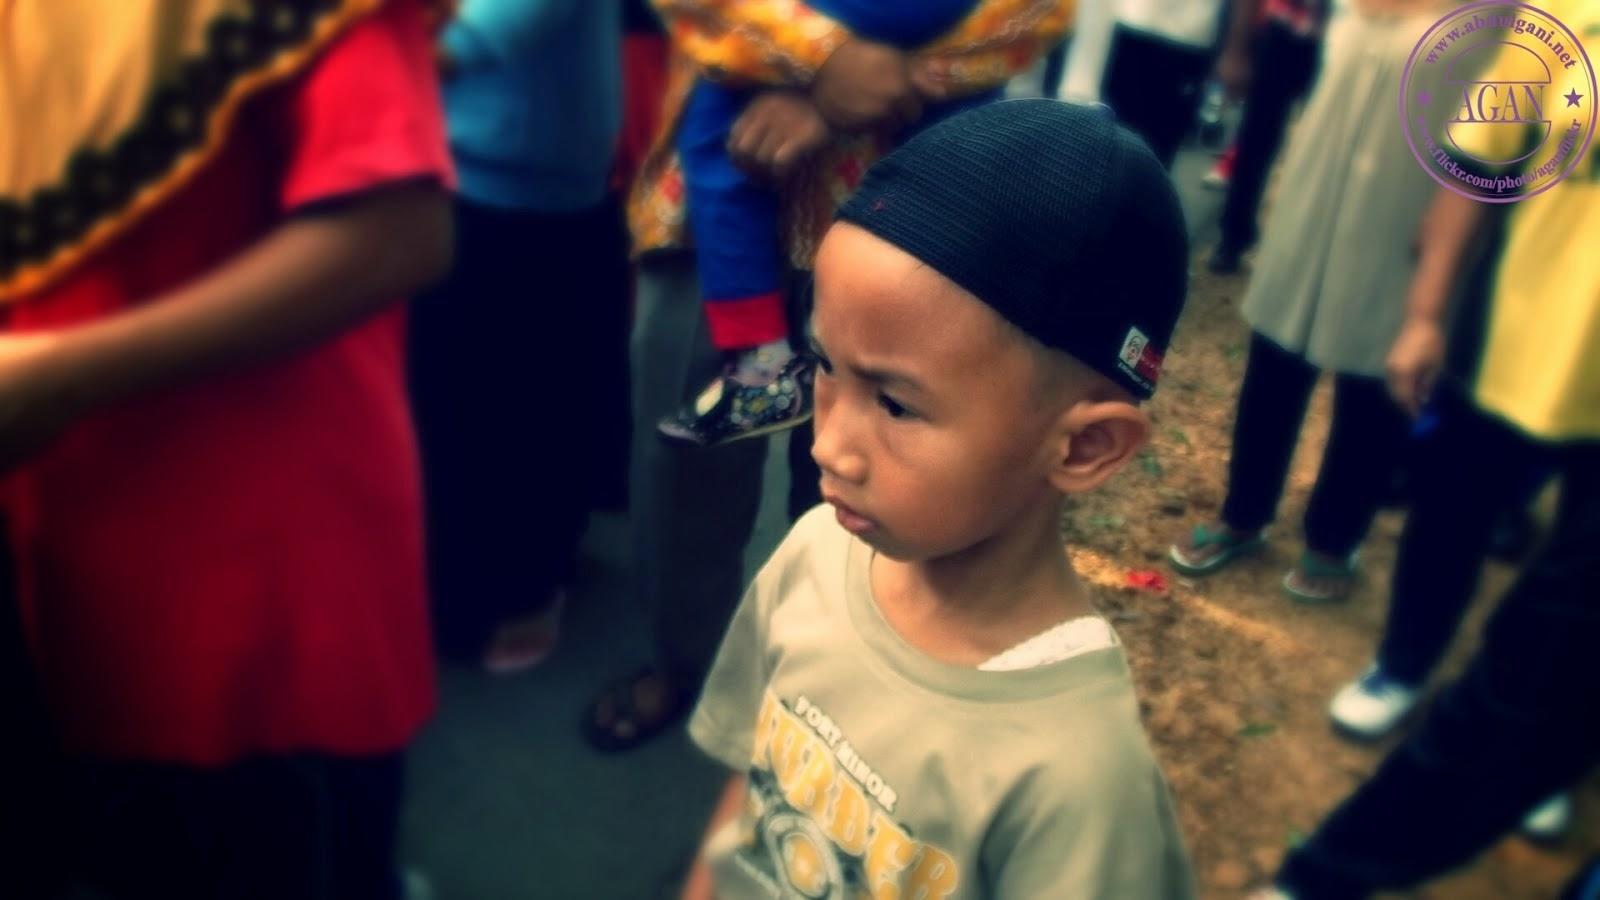 Anak Ari Amnan, Banjarsari, Angsana, Tanah Bumbu, Kalimantan Selatan, Indonesia